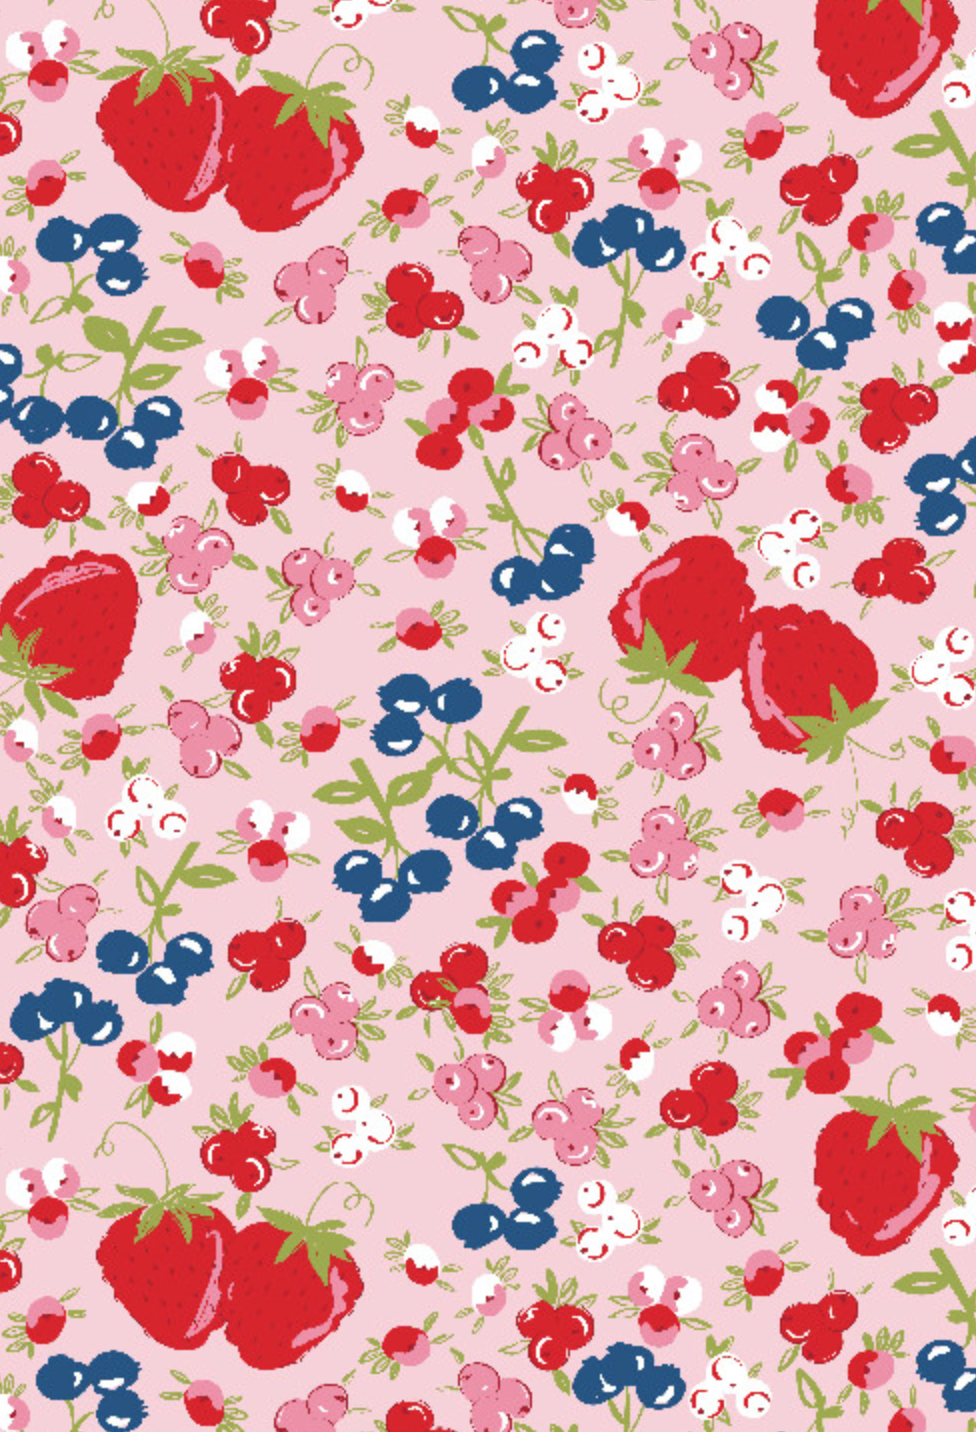 Richard Leeds International. Berries Pajama Print.